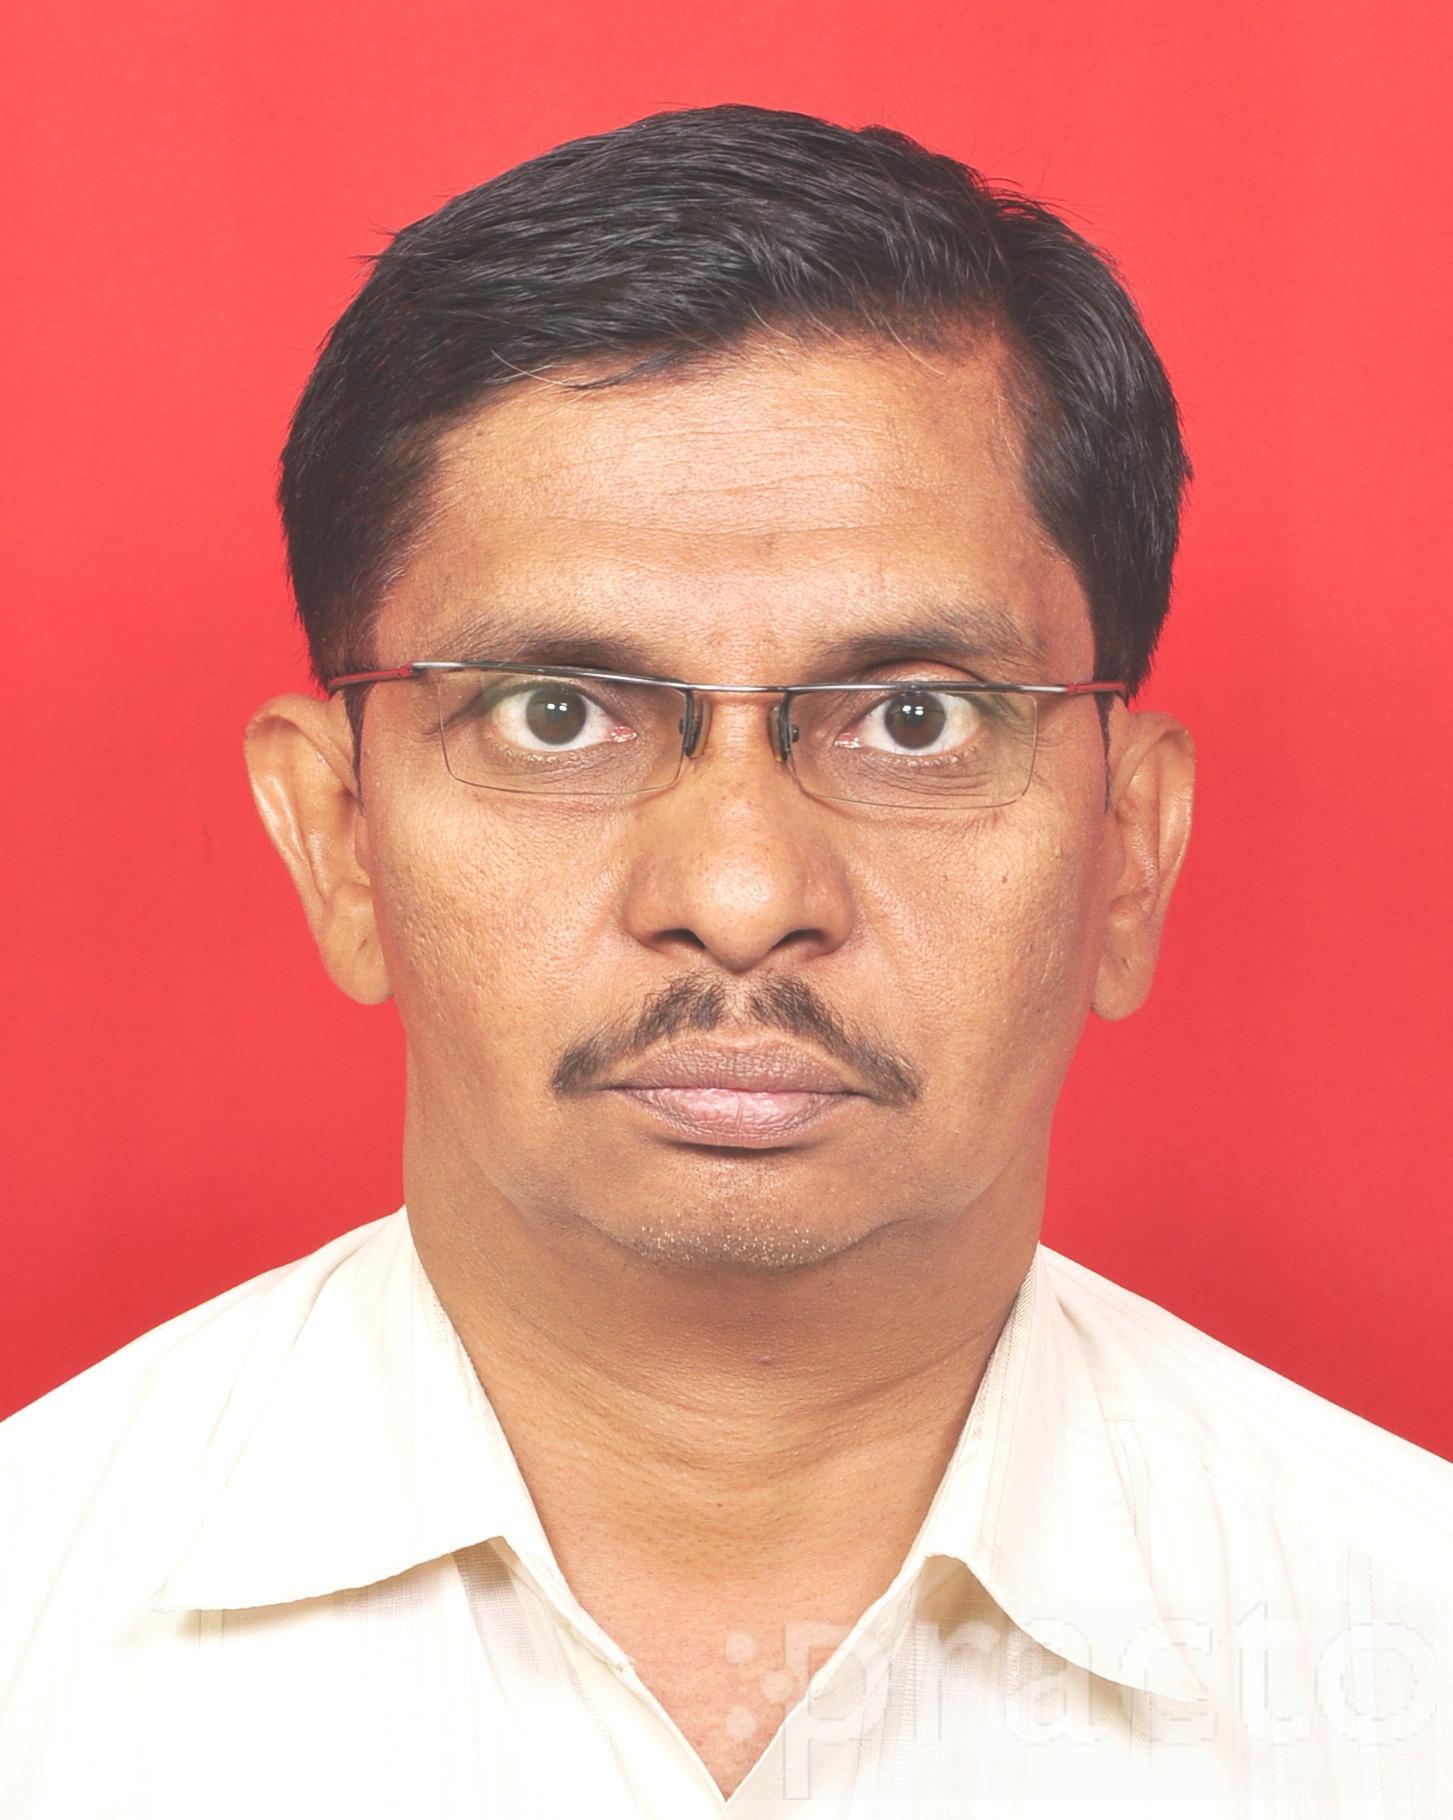 Dr. Atulkumar Bedre - Ayurveda